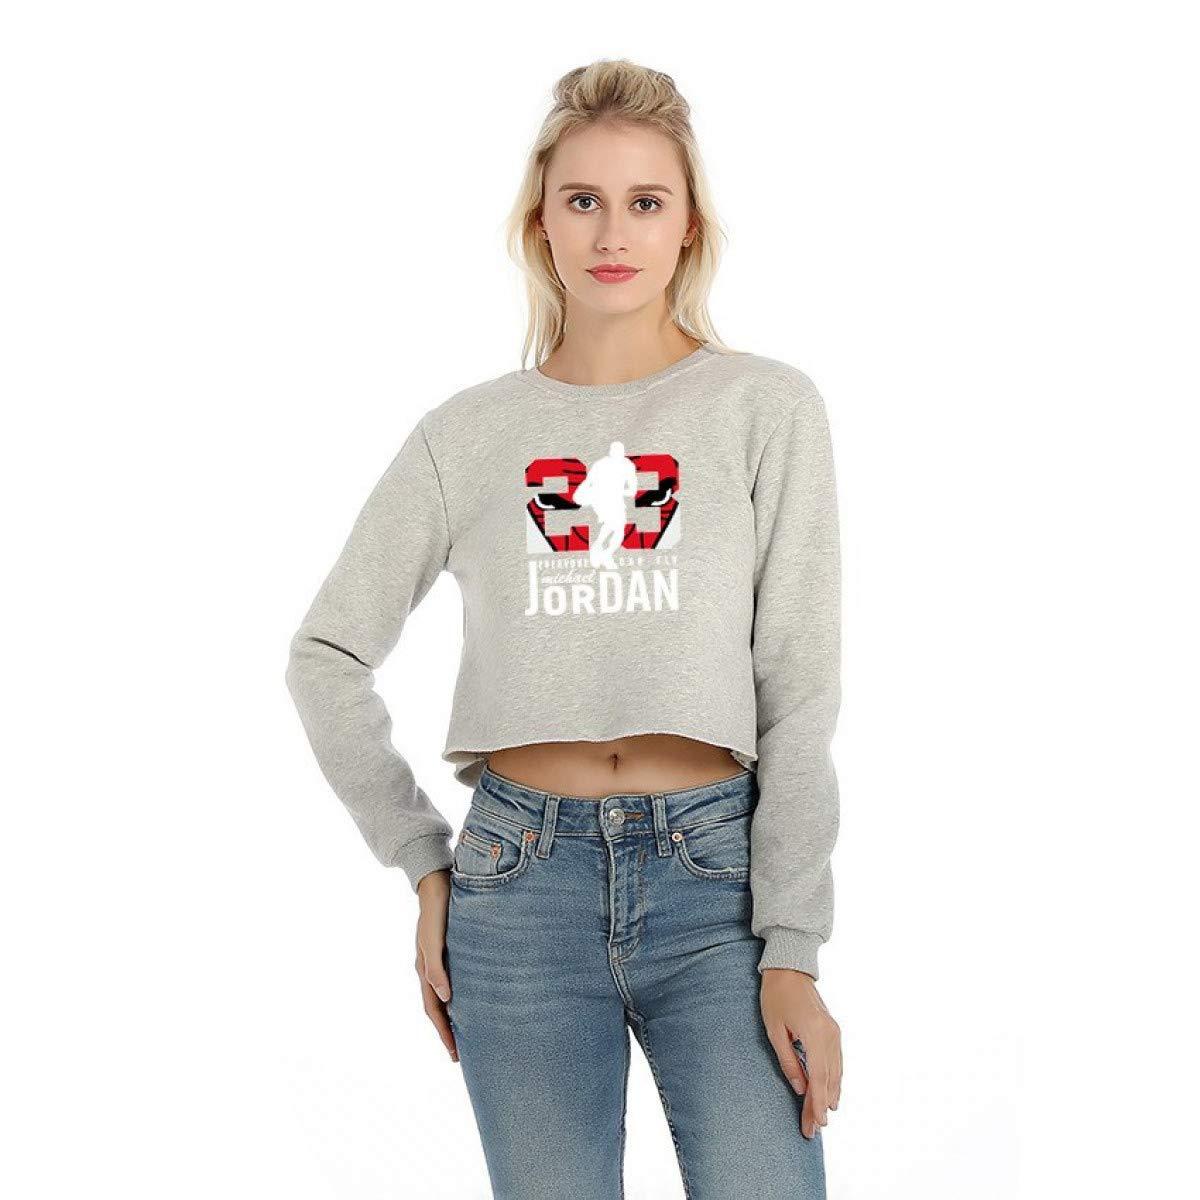 FLAMINGO_STORE Hooides Short Sweatshirts Women Hip Hop Streetwear Long Sleeve Hoody Clothing at Amazon Womens Clothing store: